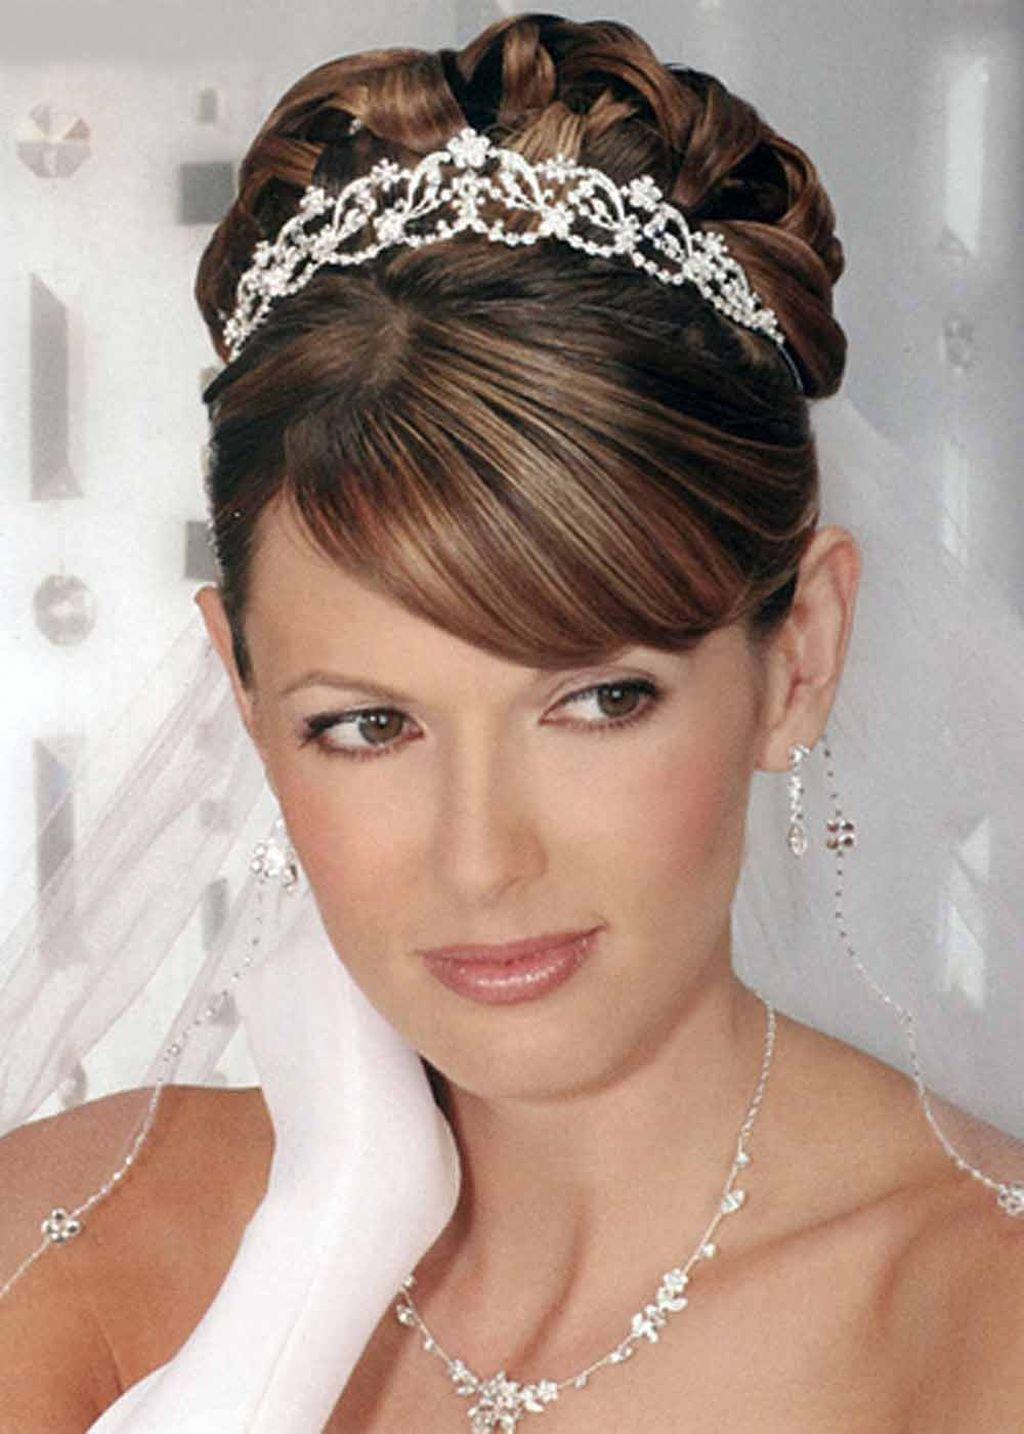 Прически невест с челкой и фатой фото